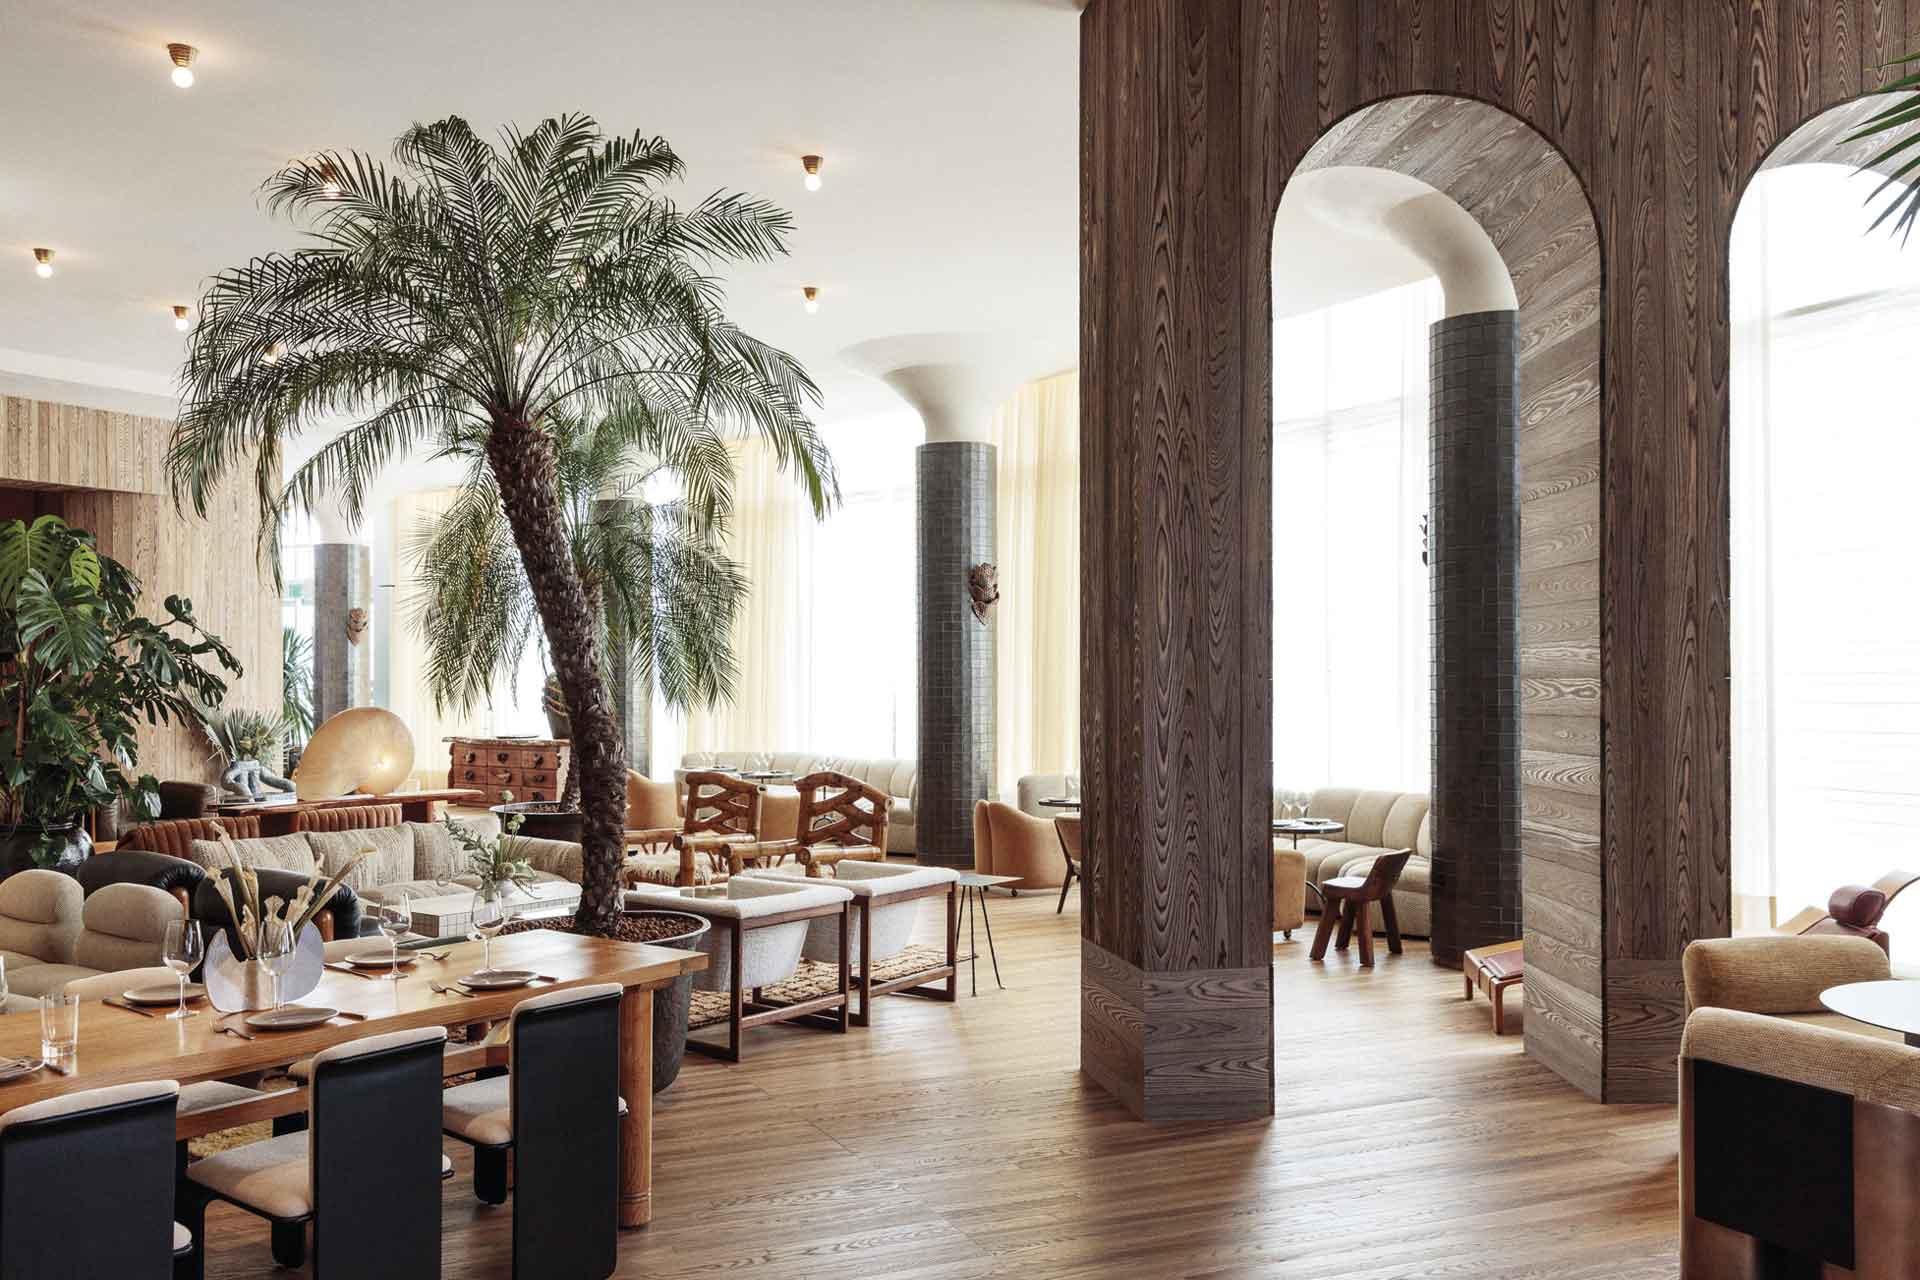 santa-monica-proper-hotel-lobby